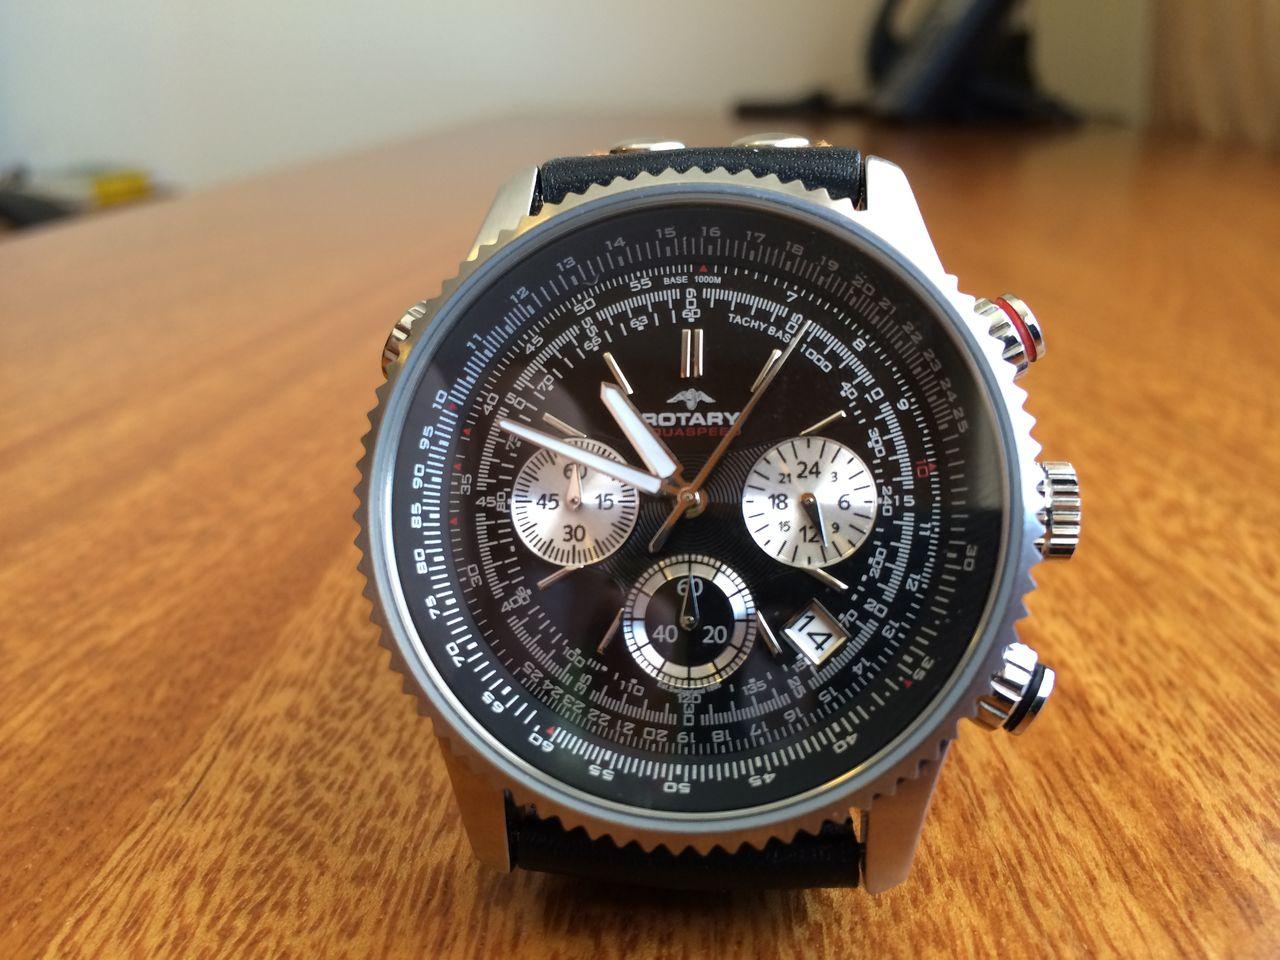 new products 9b874 4f2c5 4個目 憧れのナビタイマー。に似た時計 ROTARY AQUASPEED ...